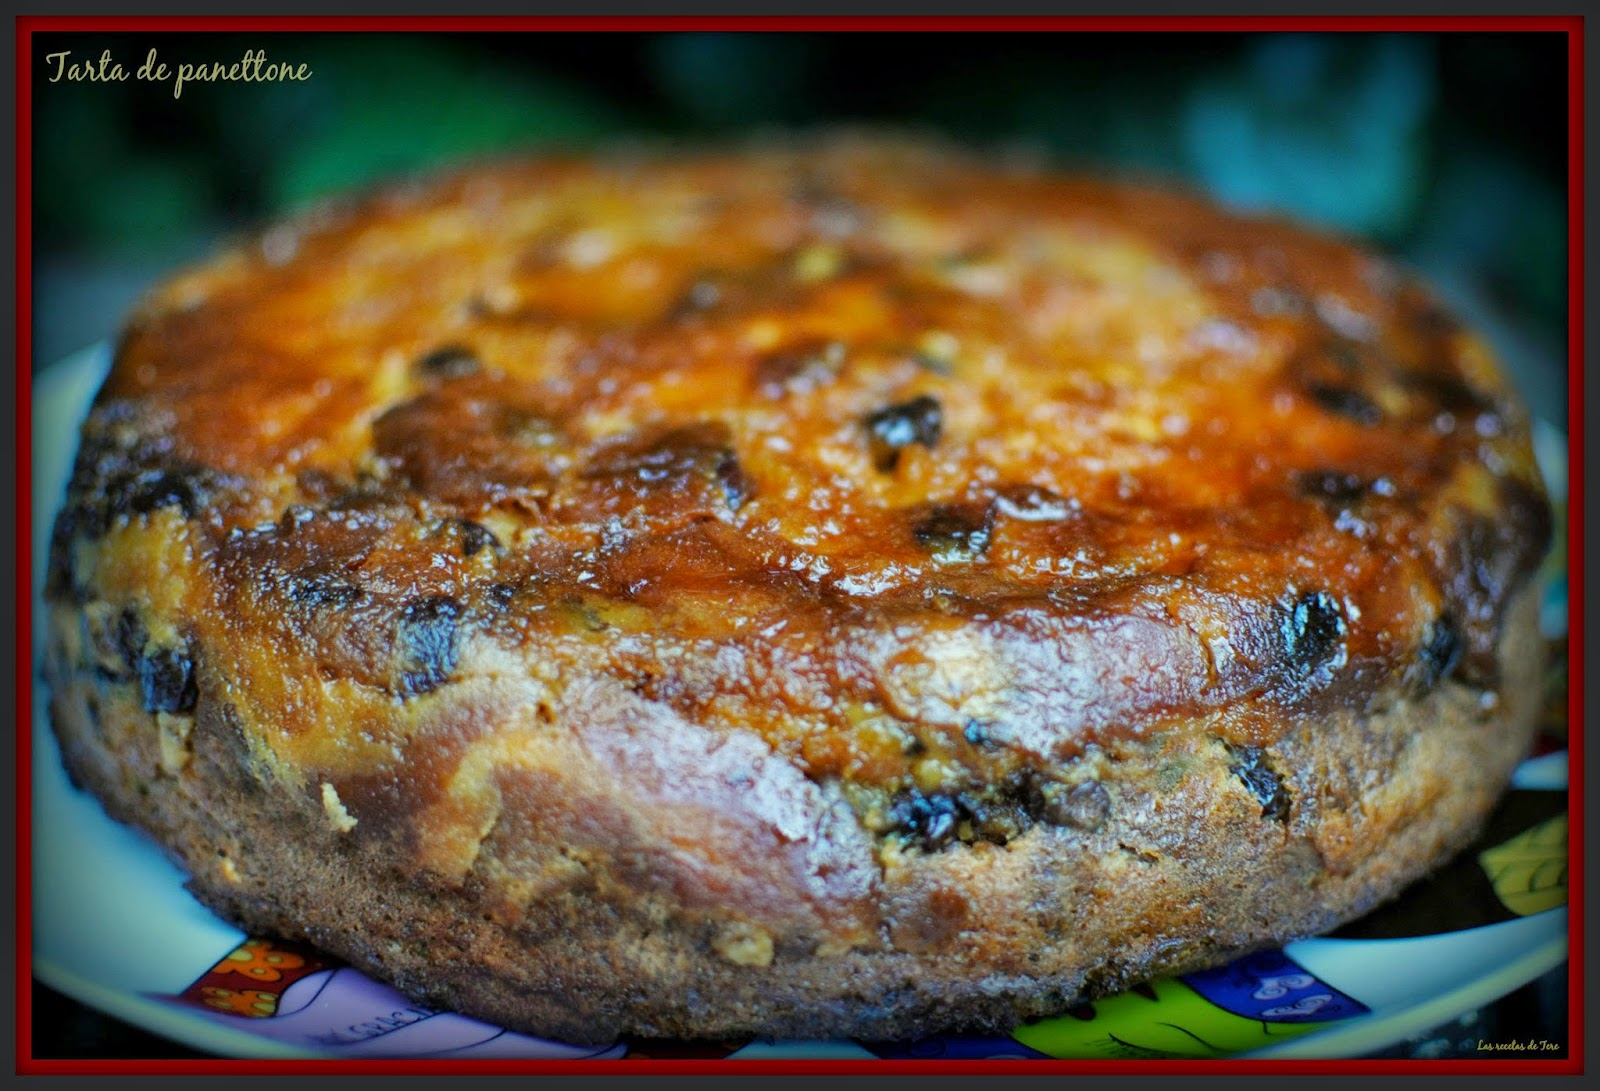 tarta de panettone tererecetas 03